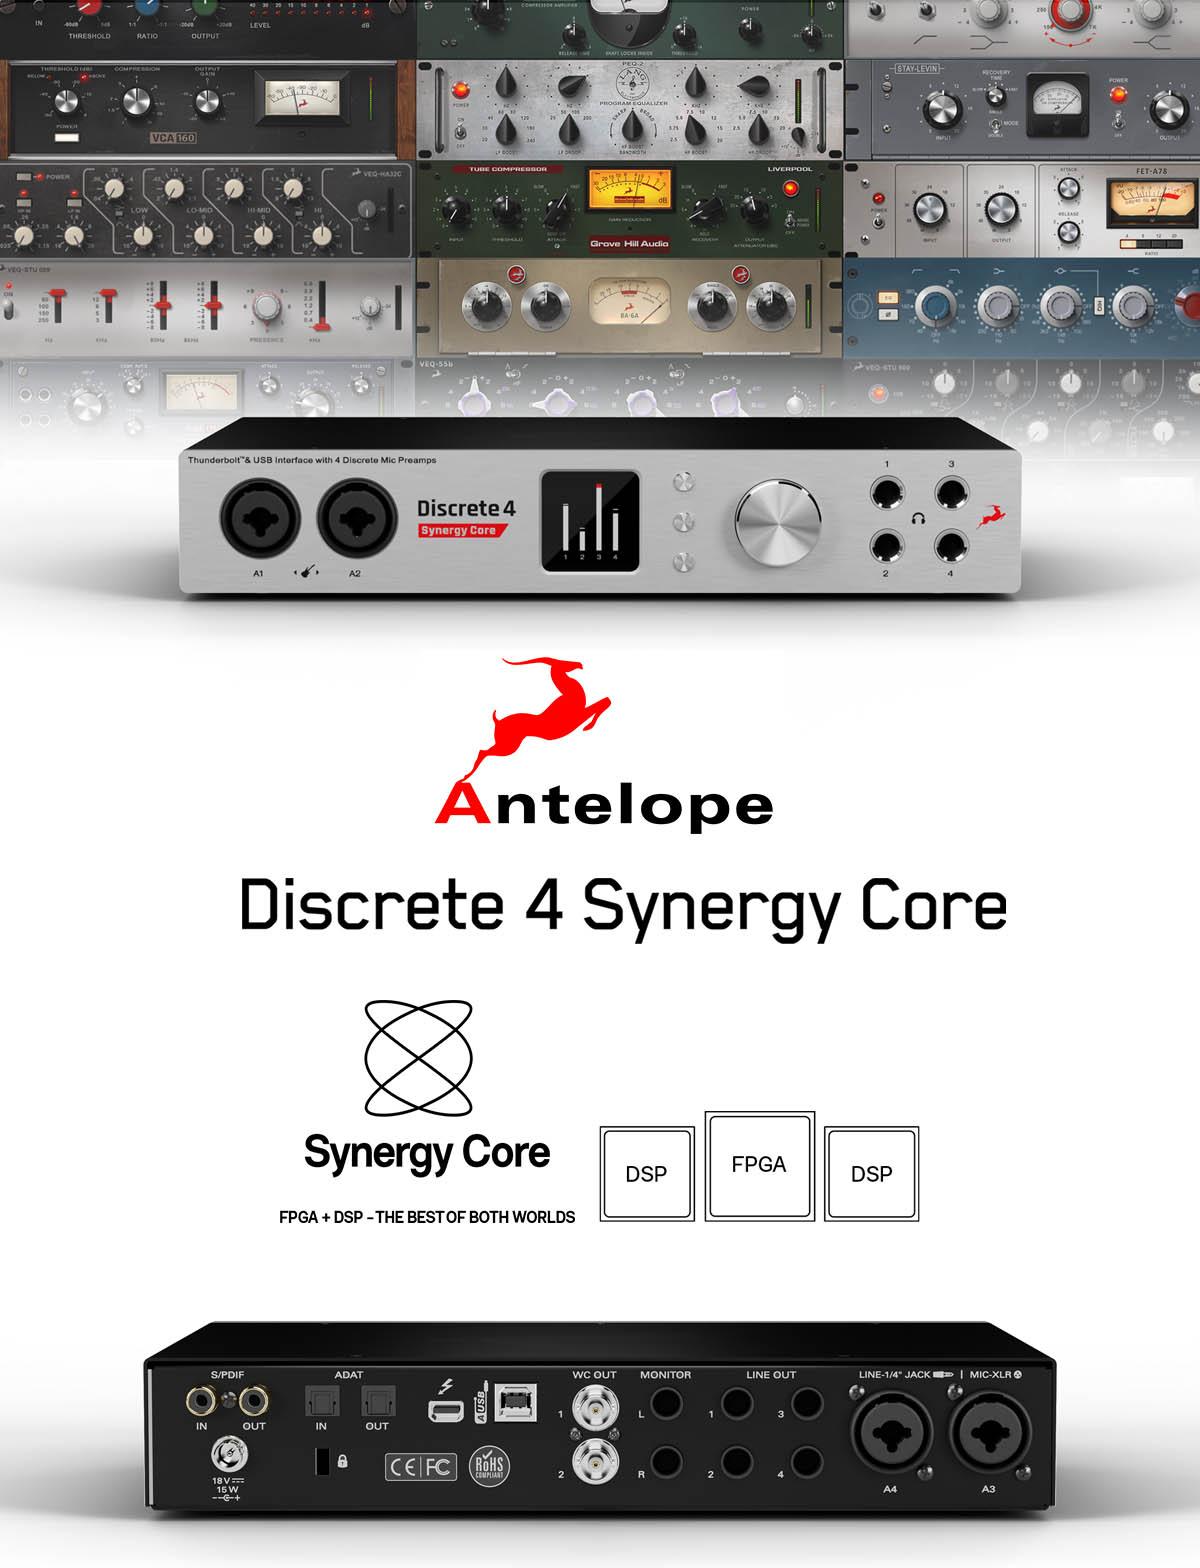 Discrete 4 Synergy Core